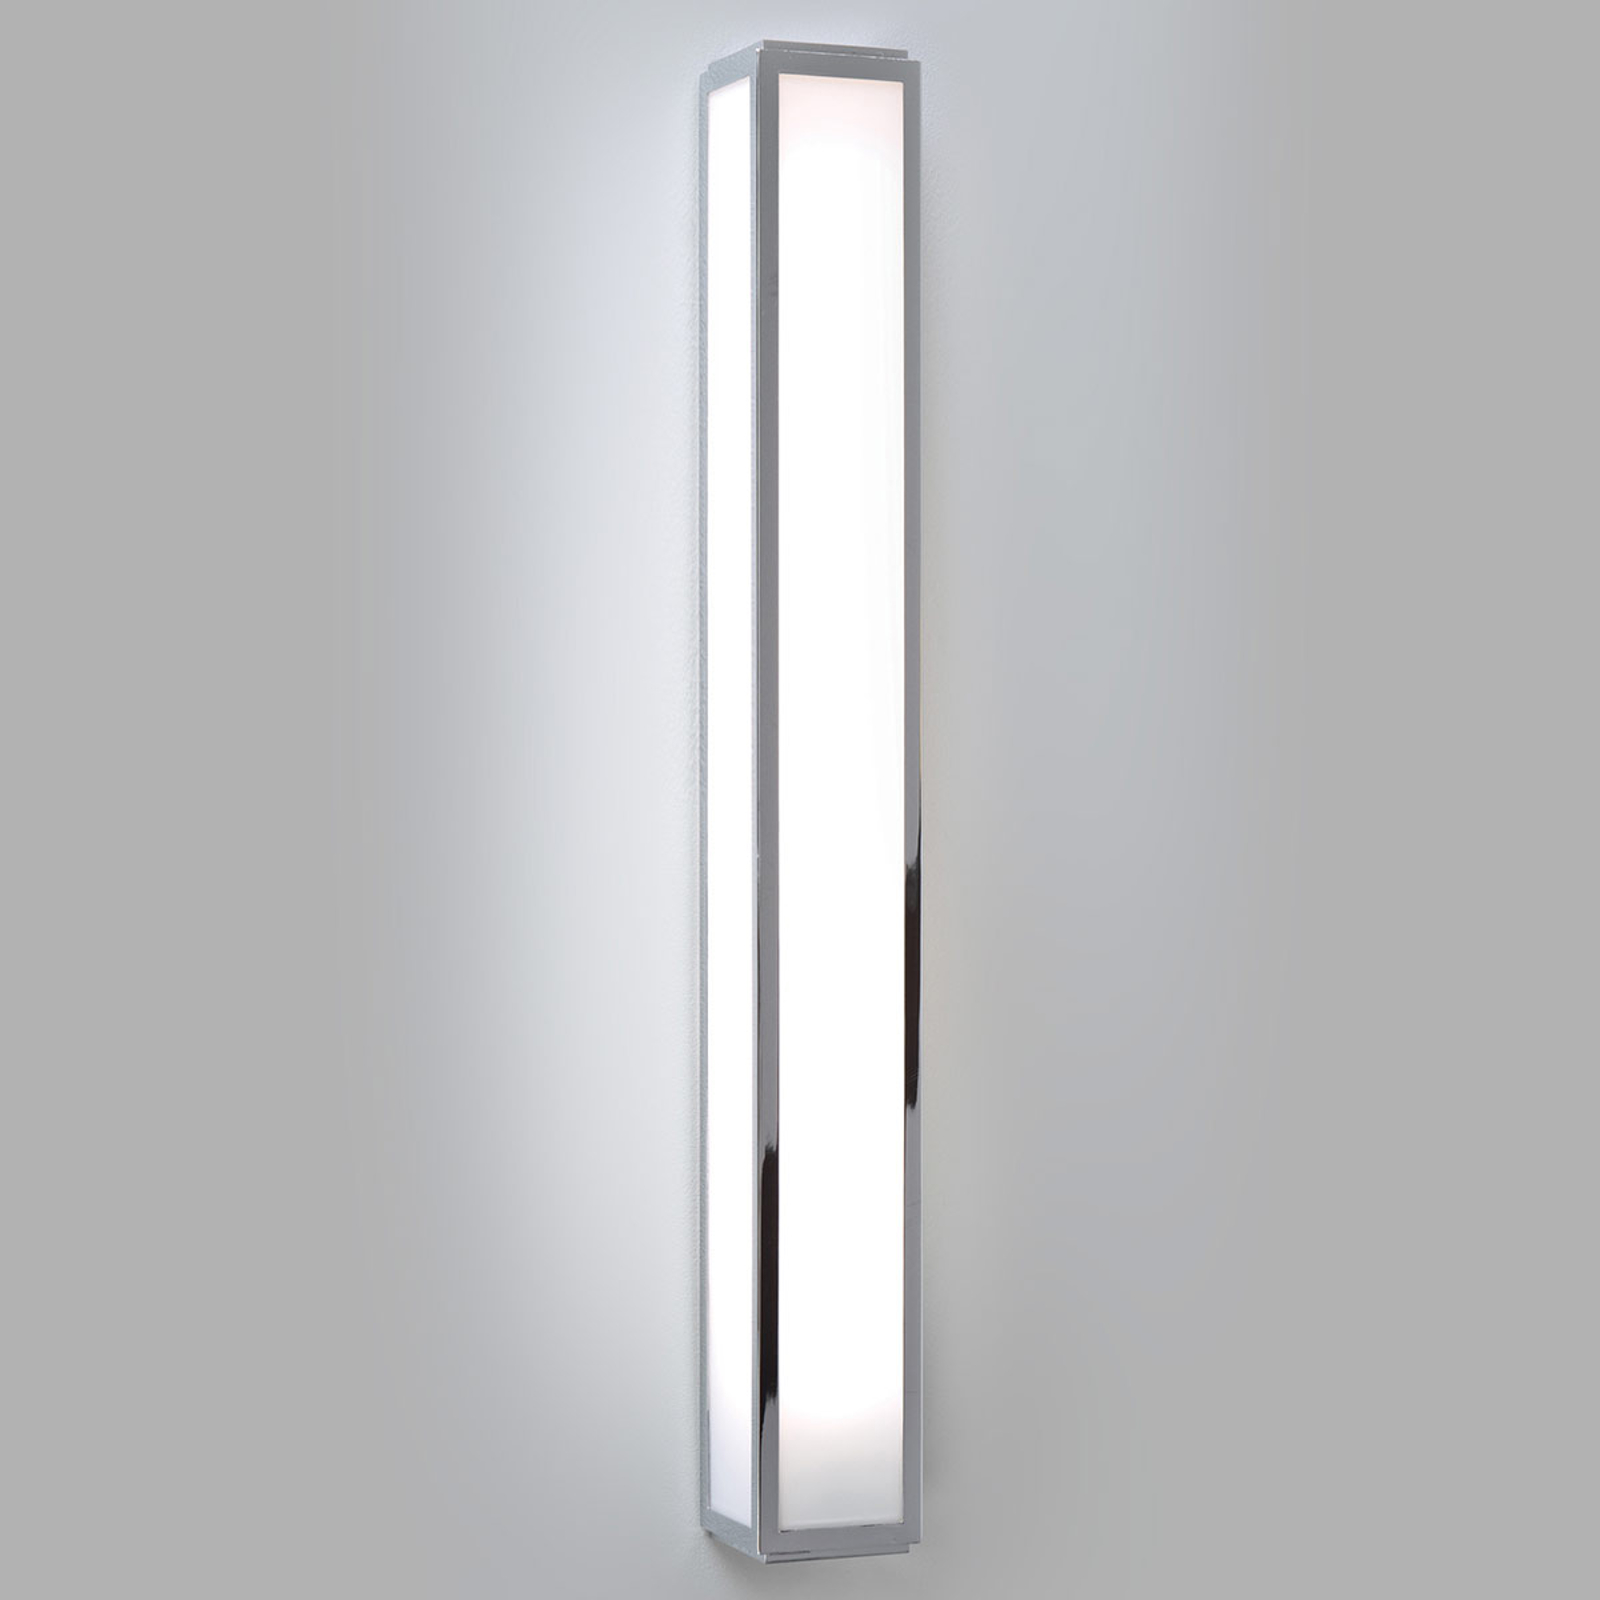 Mashiko 600 LED Wall Light Elongated_1020485_1